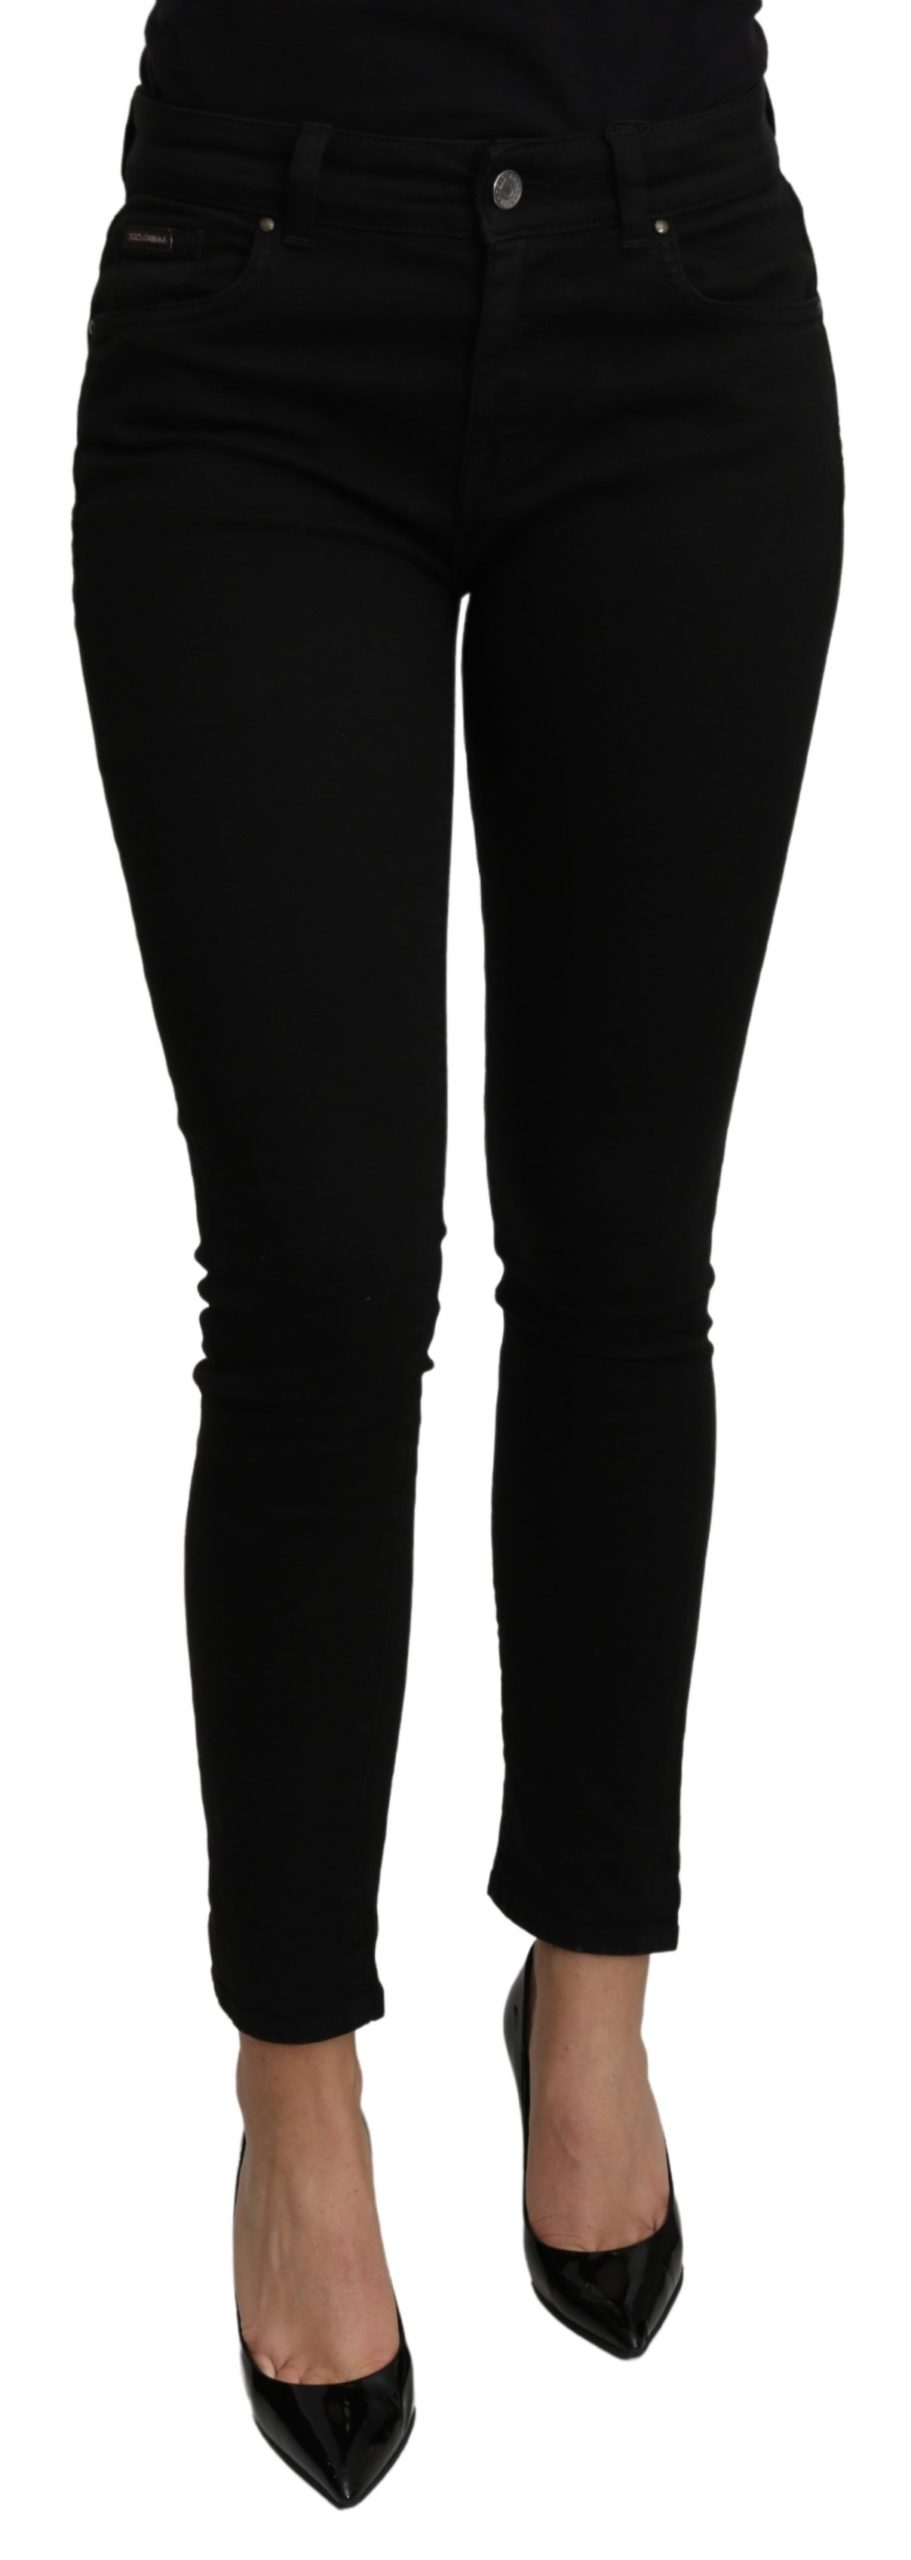 Dolce & Gabbana Women's Skinny Mid Waist Cotton Jeans Black PAN70977 - IT38 XS